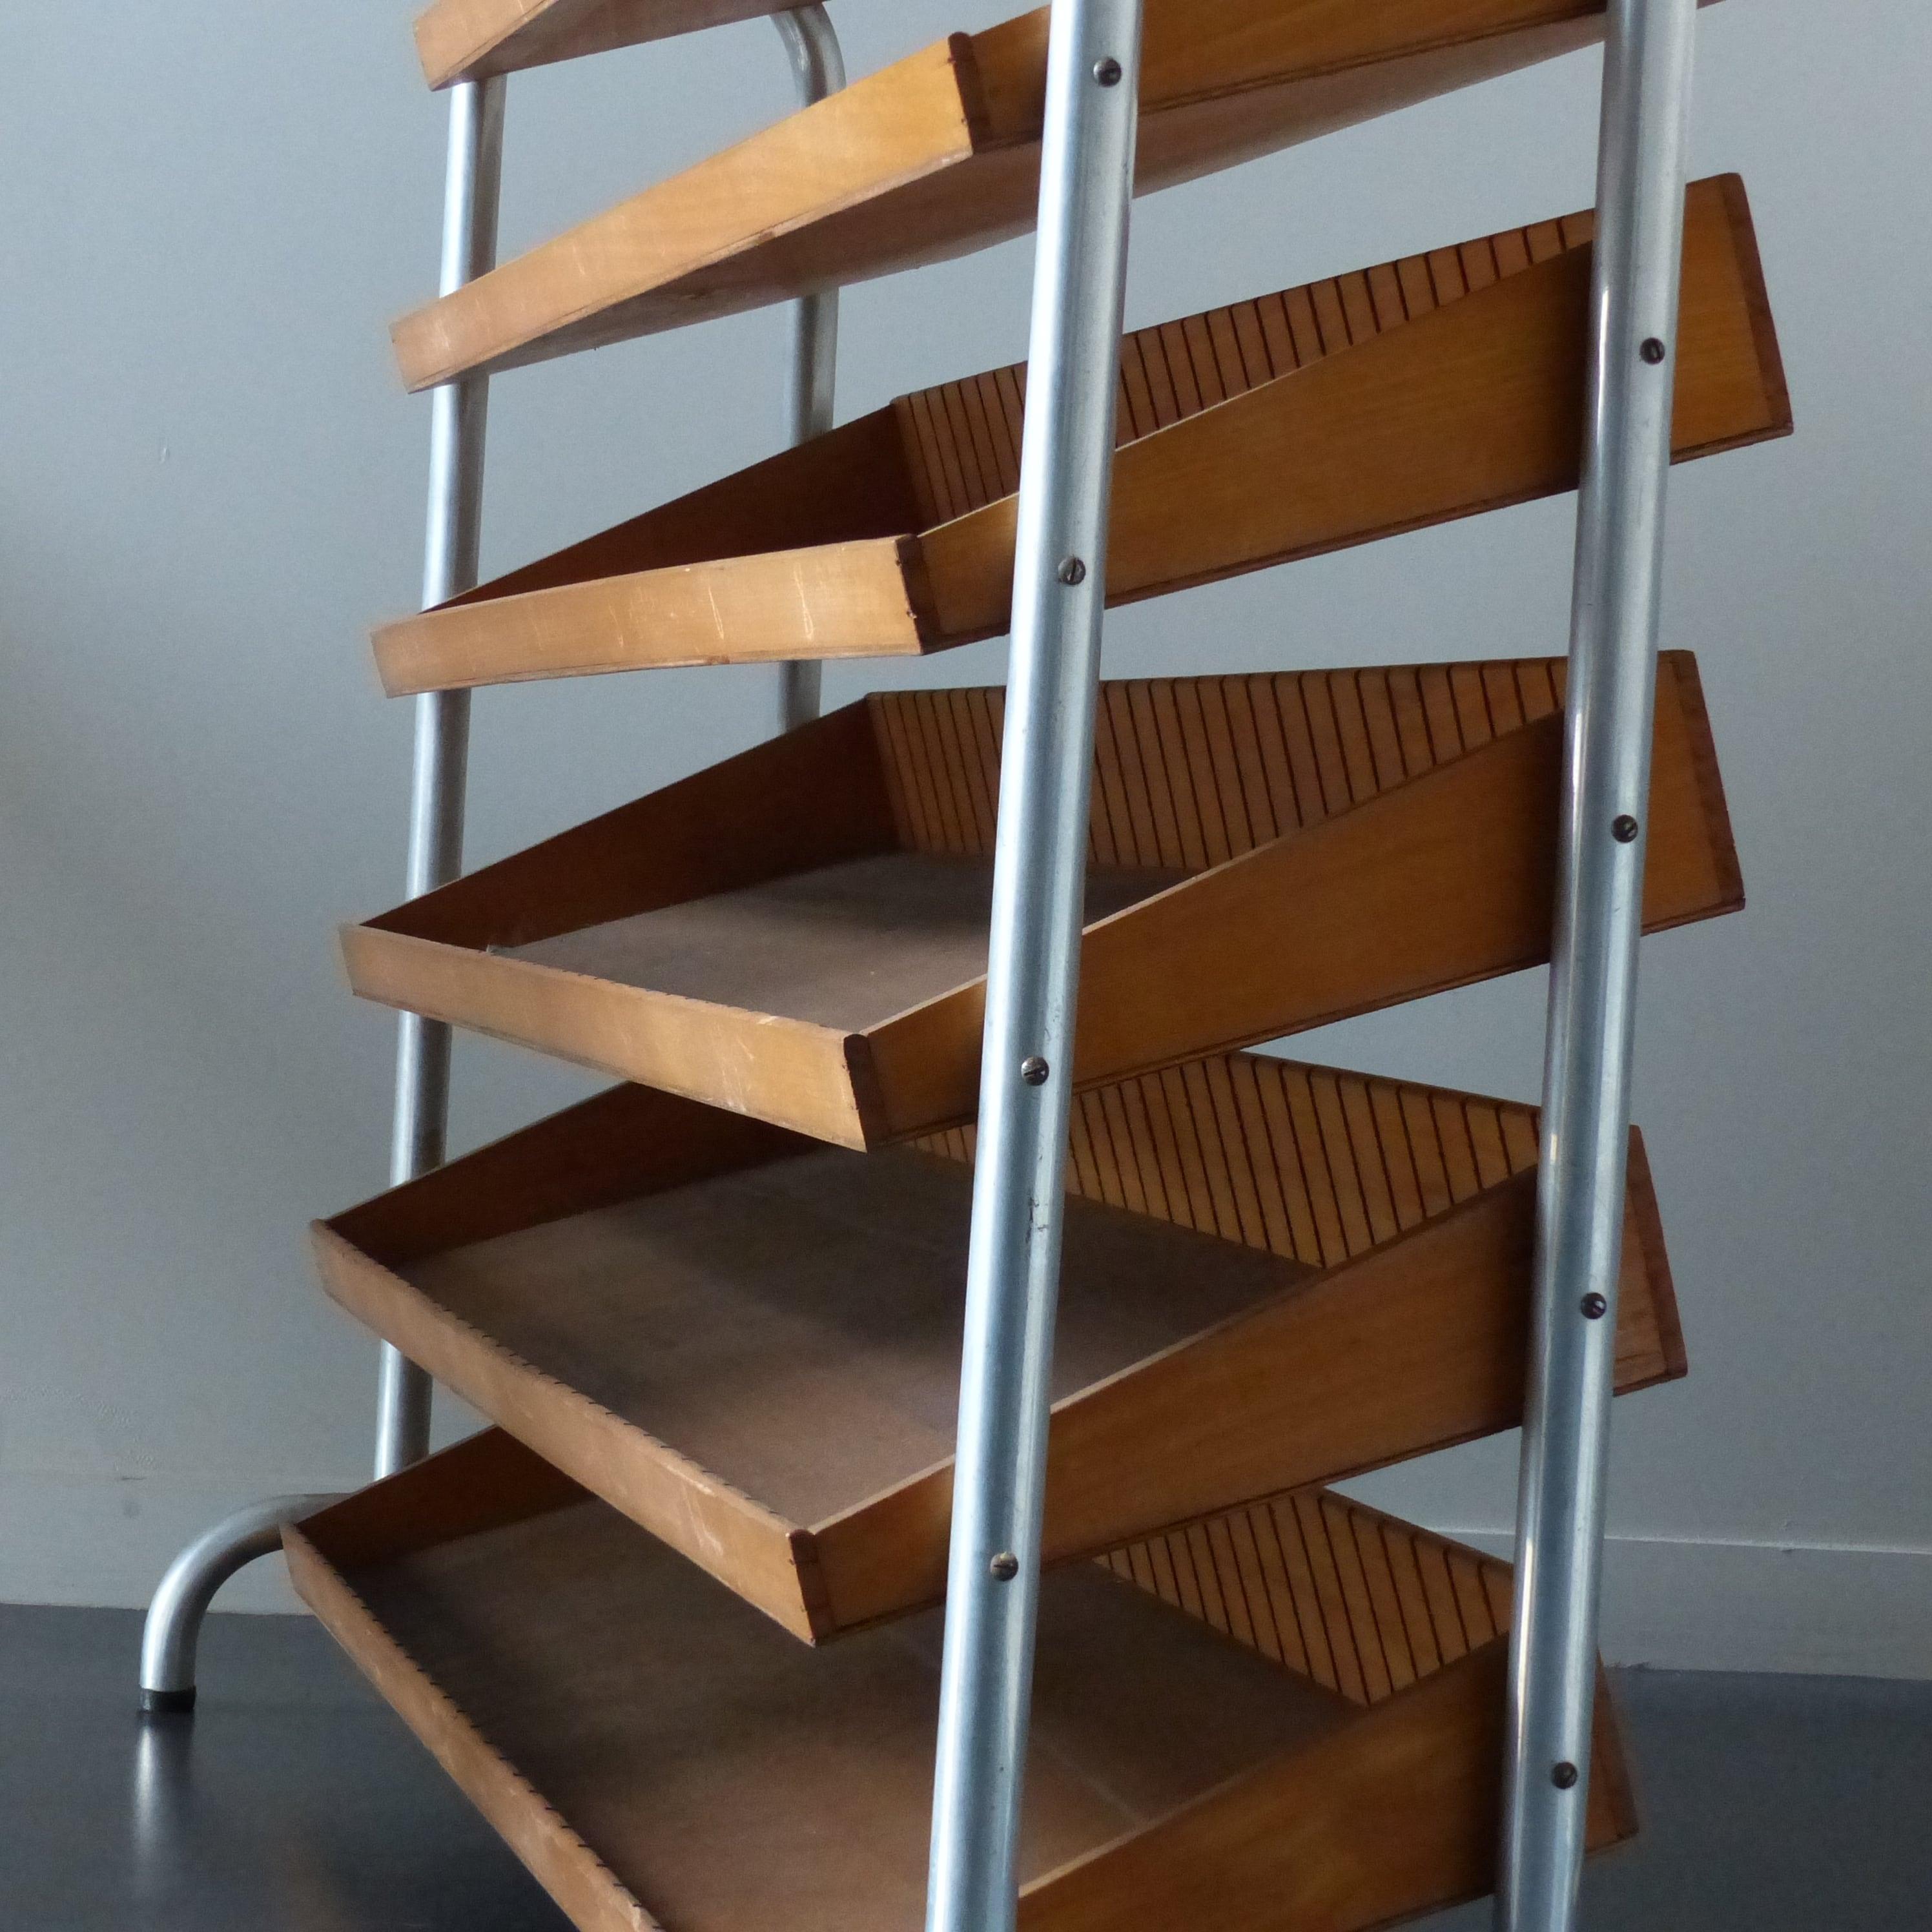 meuble pr sentoir de mercerie clayettes en bois lignedebrocante brocante en ligne chine pour. Black Bedroom Furniture Sets. Home Design Ideas